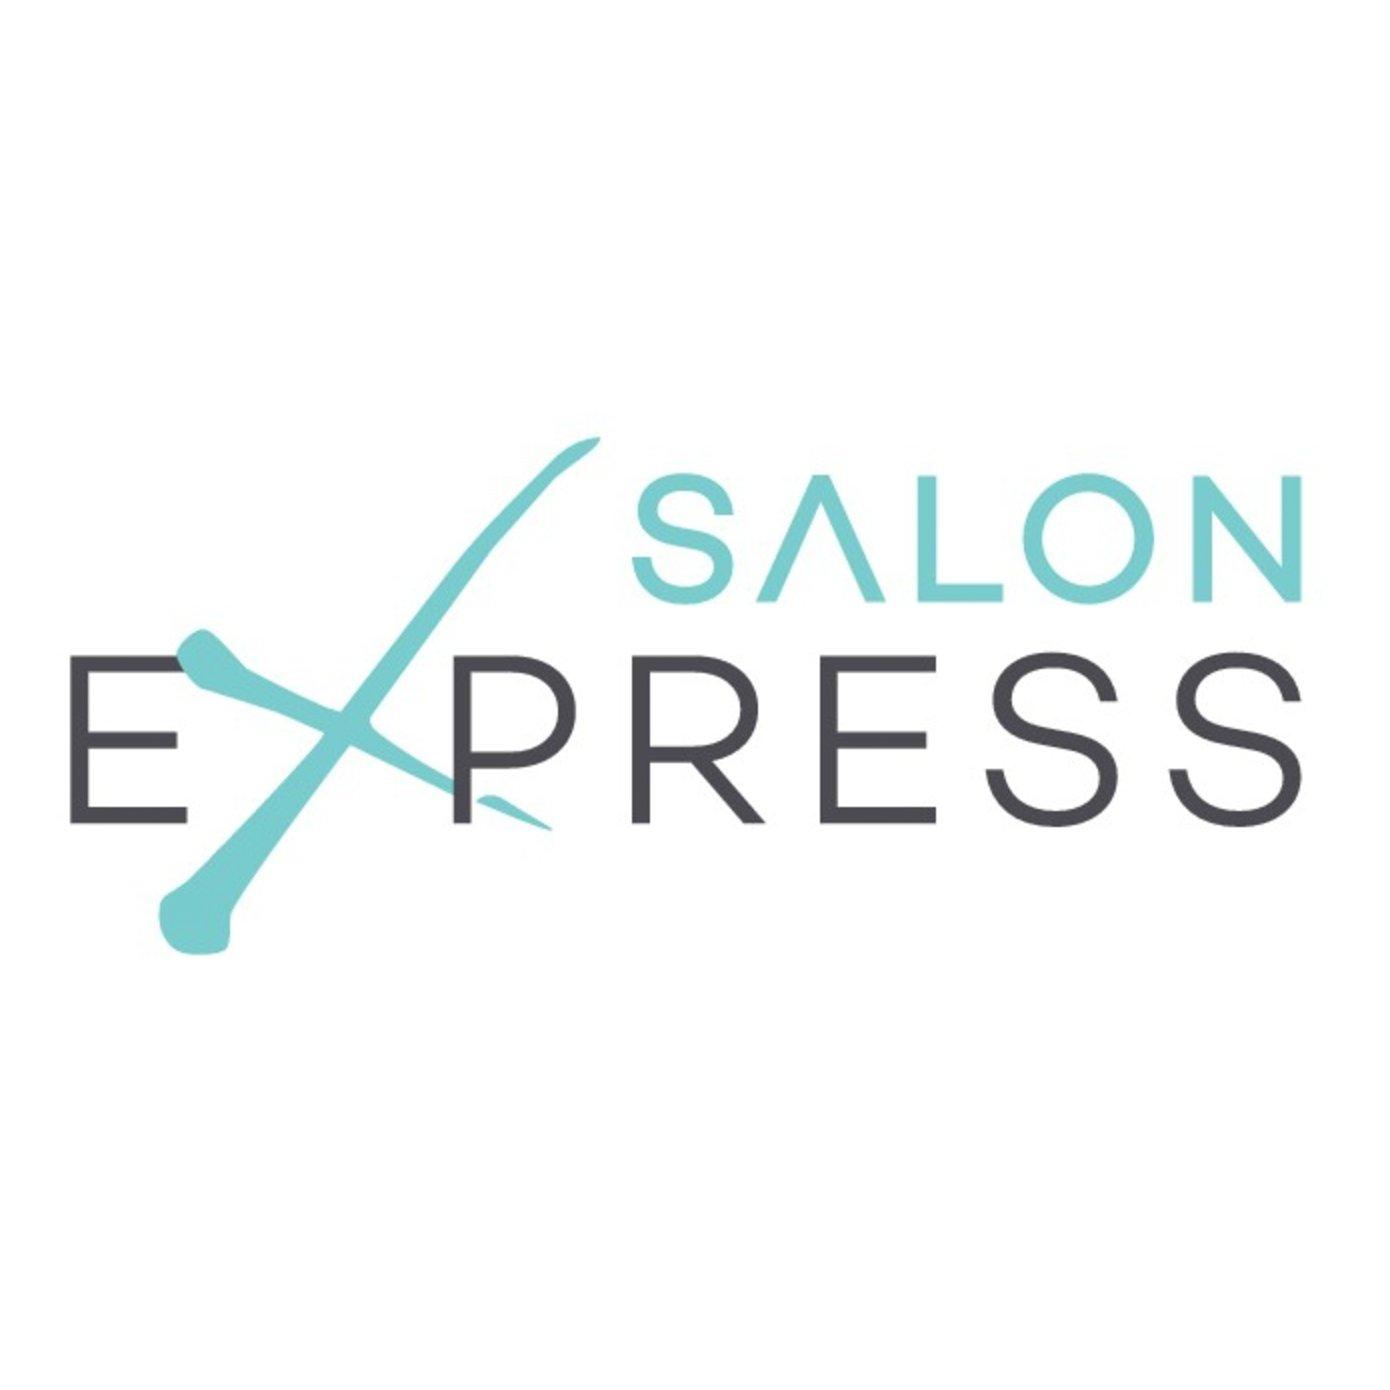 Salon express salonexpressirl twitter for 365 salon success